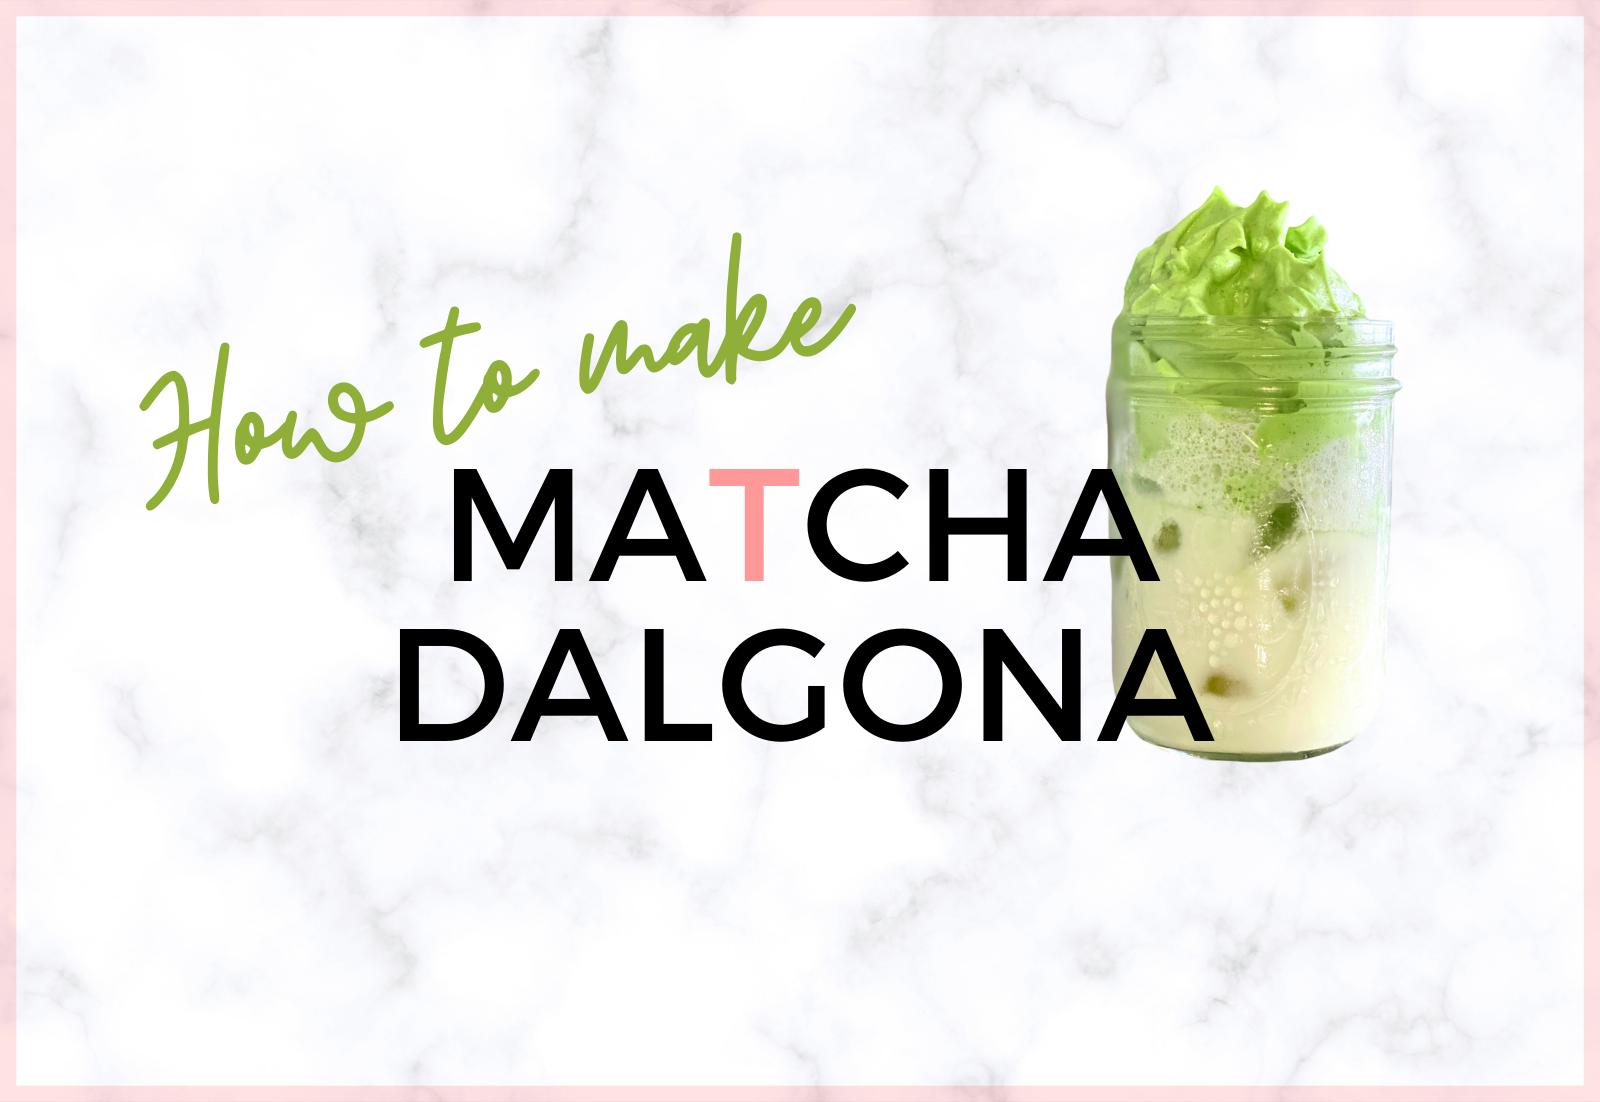 how to make a matcha dalgona